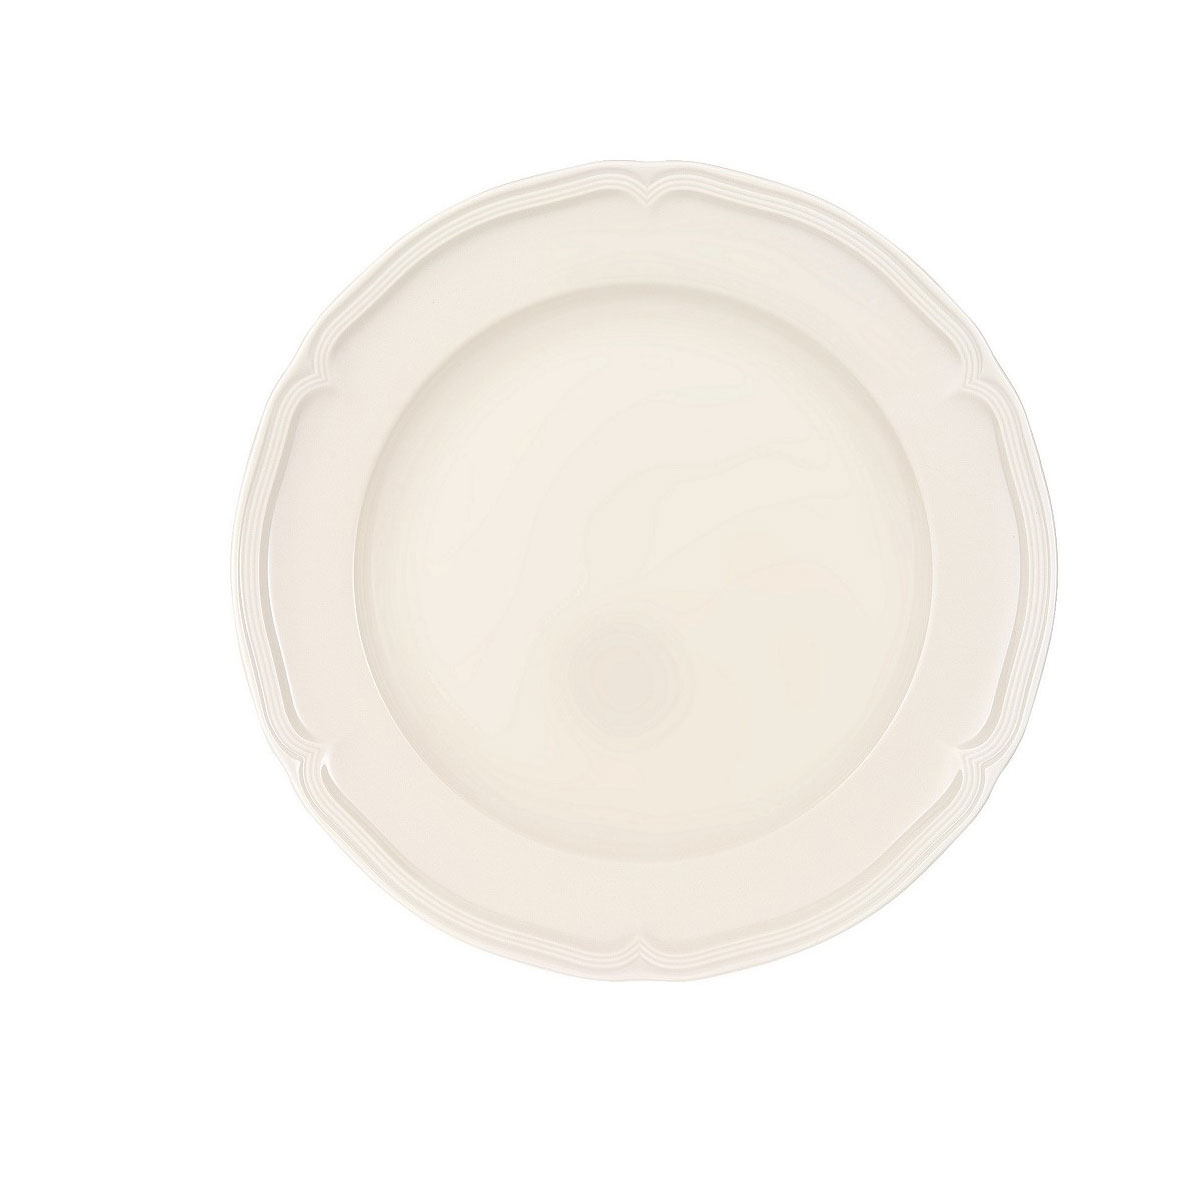 Villeroy and Boch Manoir Dinner Plate, Single